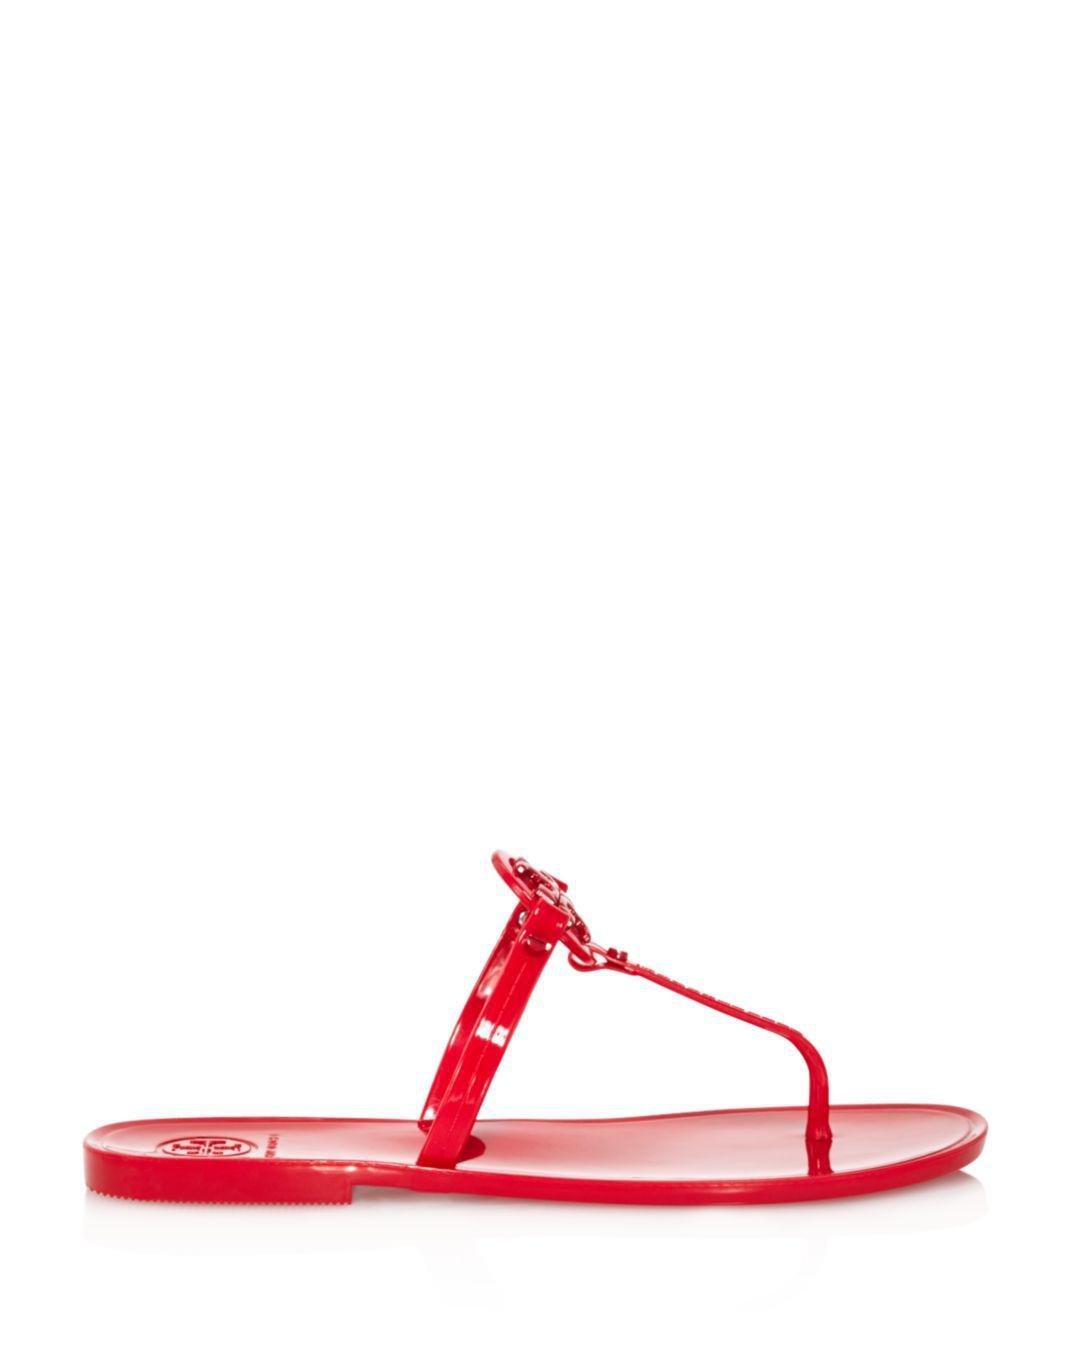 a1e7b352b Lyst - Tory Burch Women s Mini Miller Thong Sandals in Red